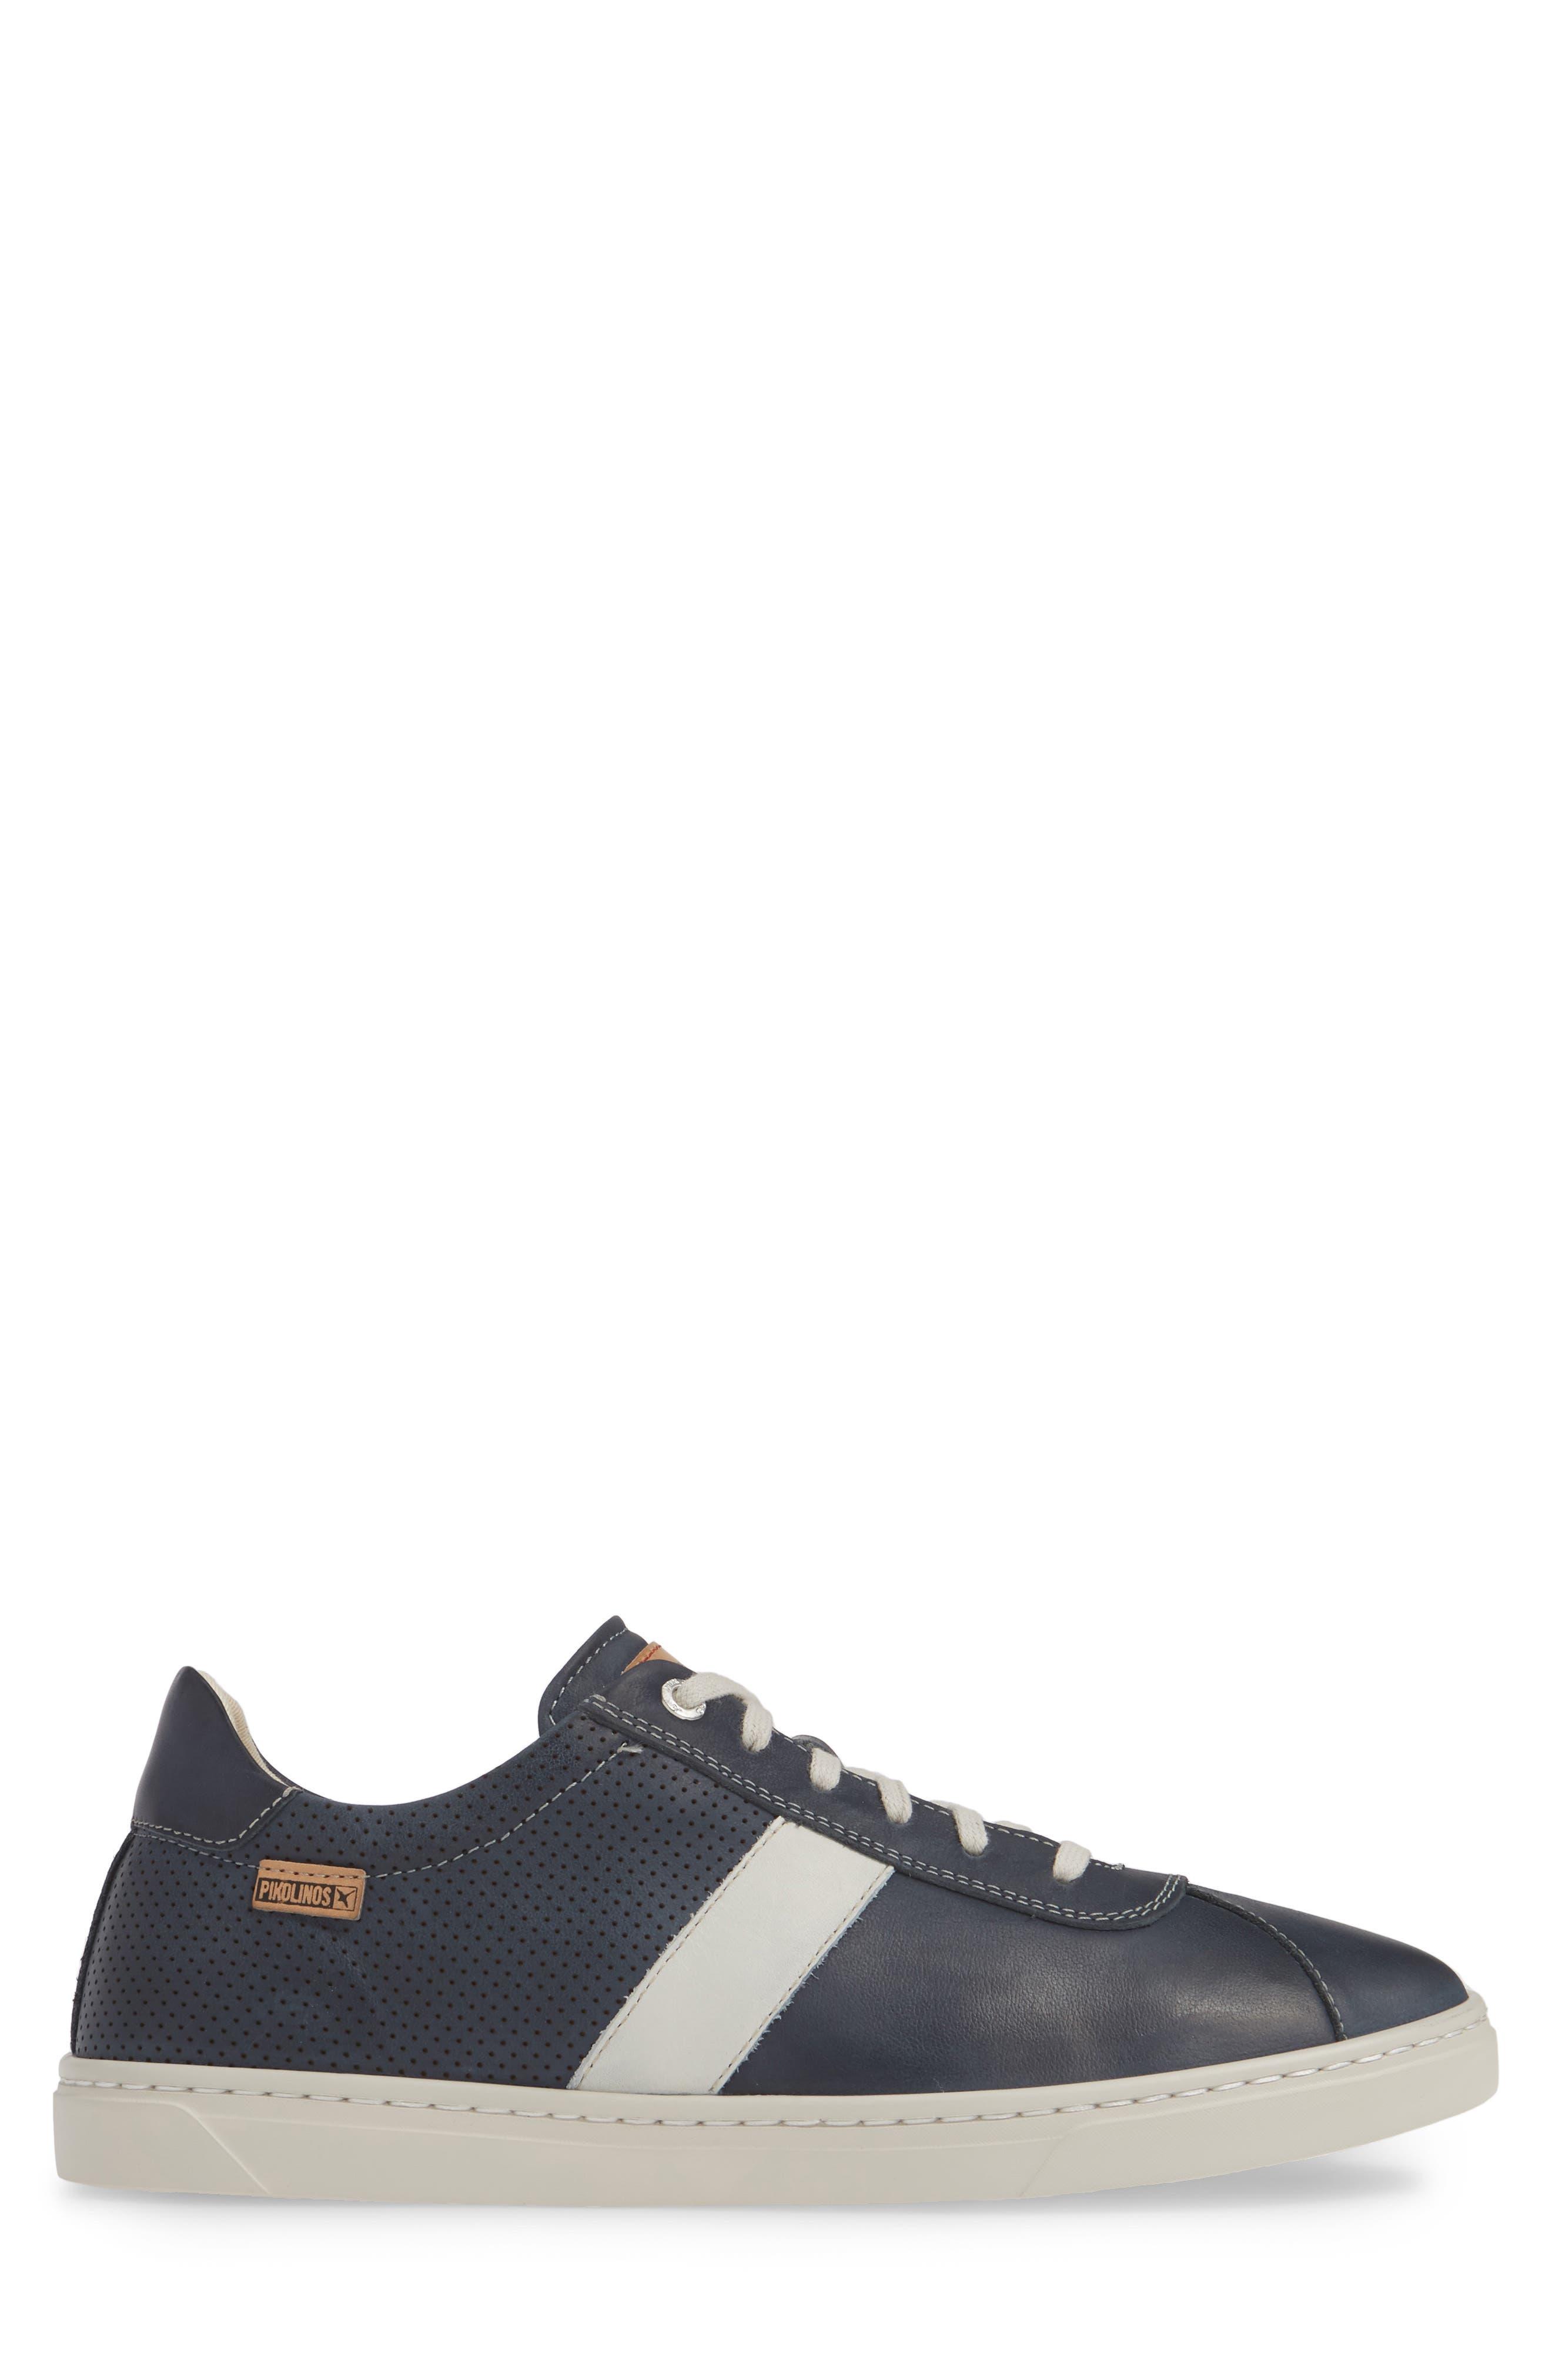 PIKOLINOS, Belfort Perforated Sneaker, Alternate thumbnail 3, color, BLUE